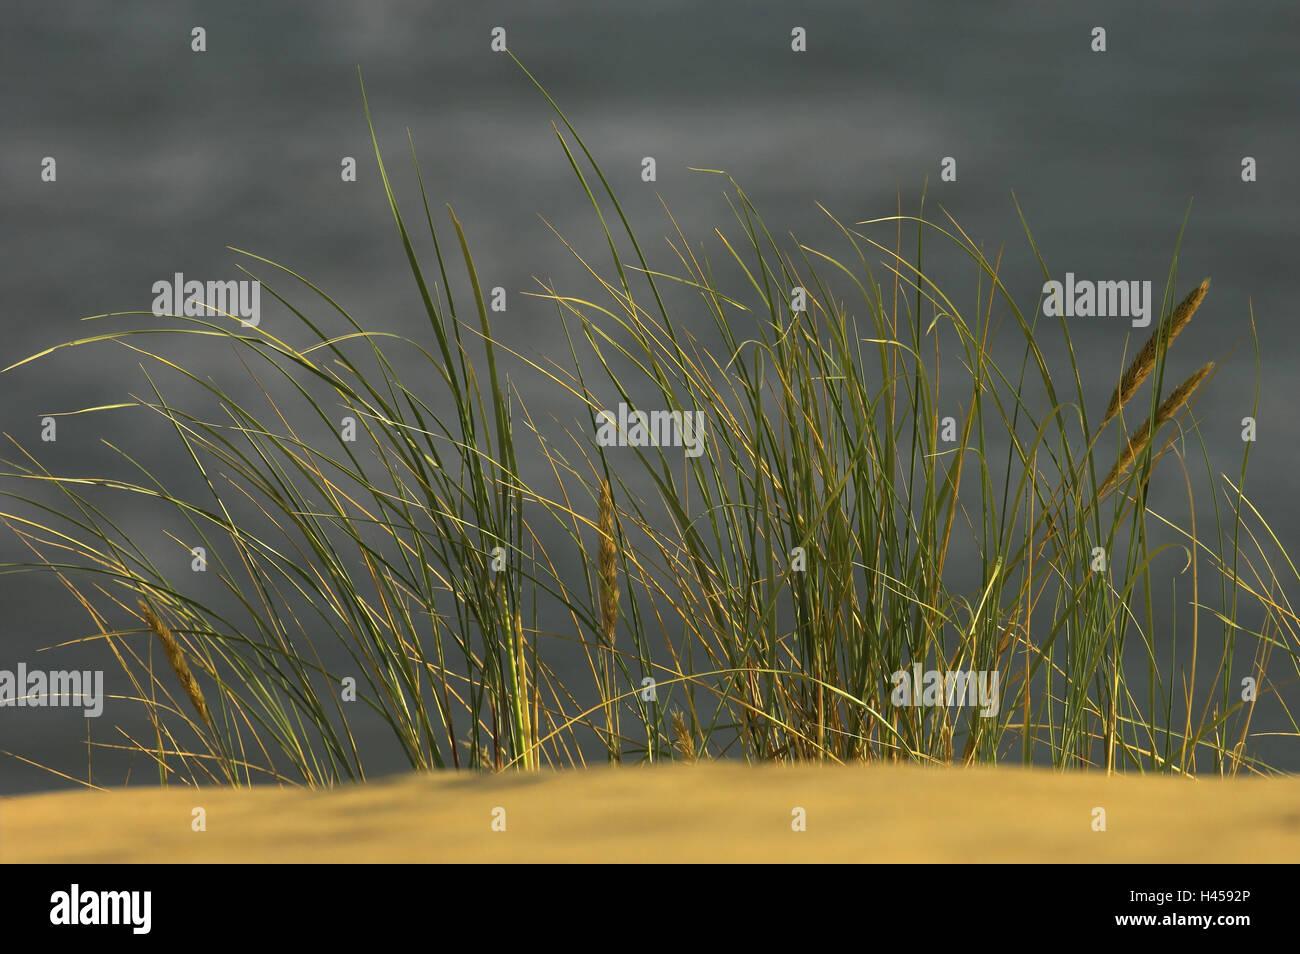 Beach oat, dune, Nida, national park health resort broad bay bar, Lithuania, - Stock Image